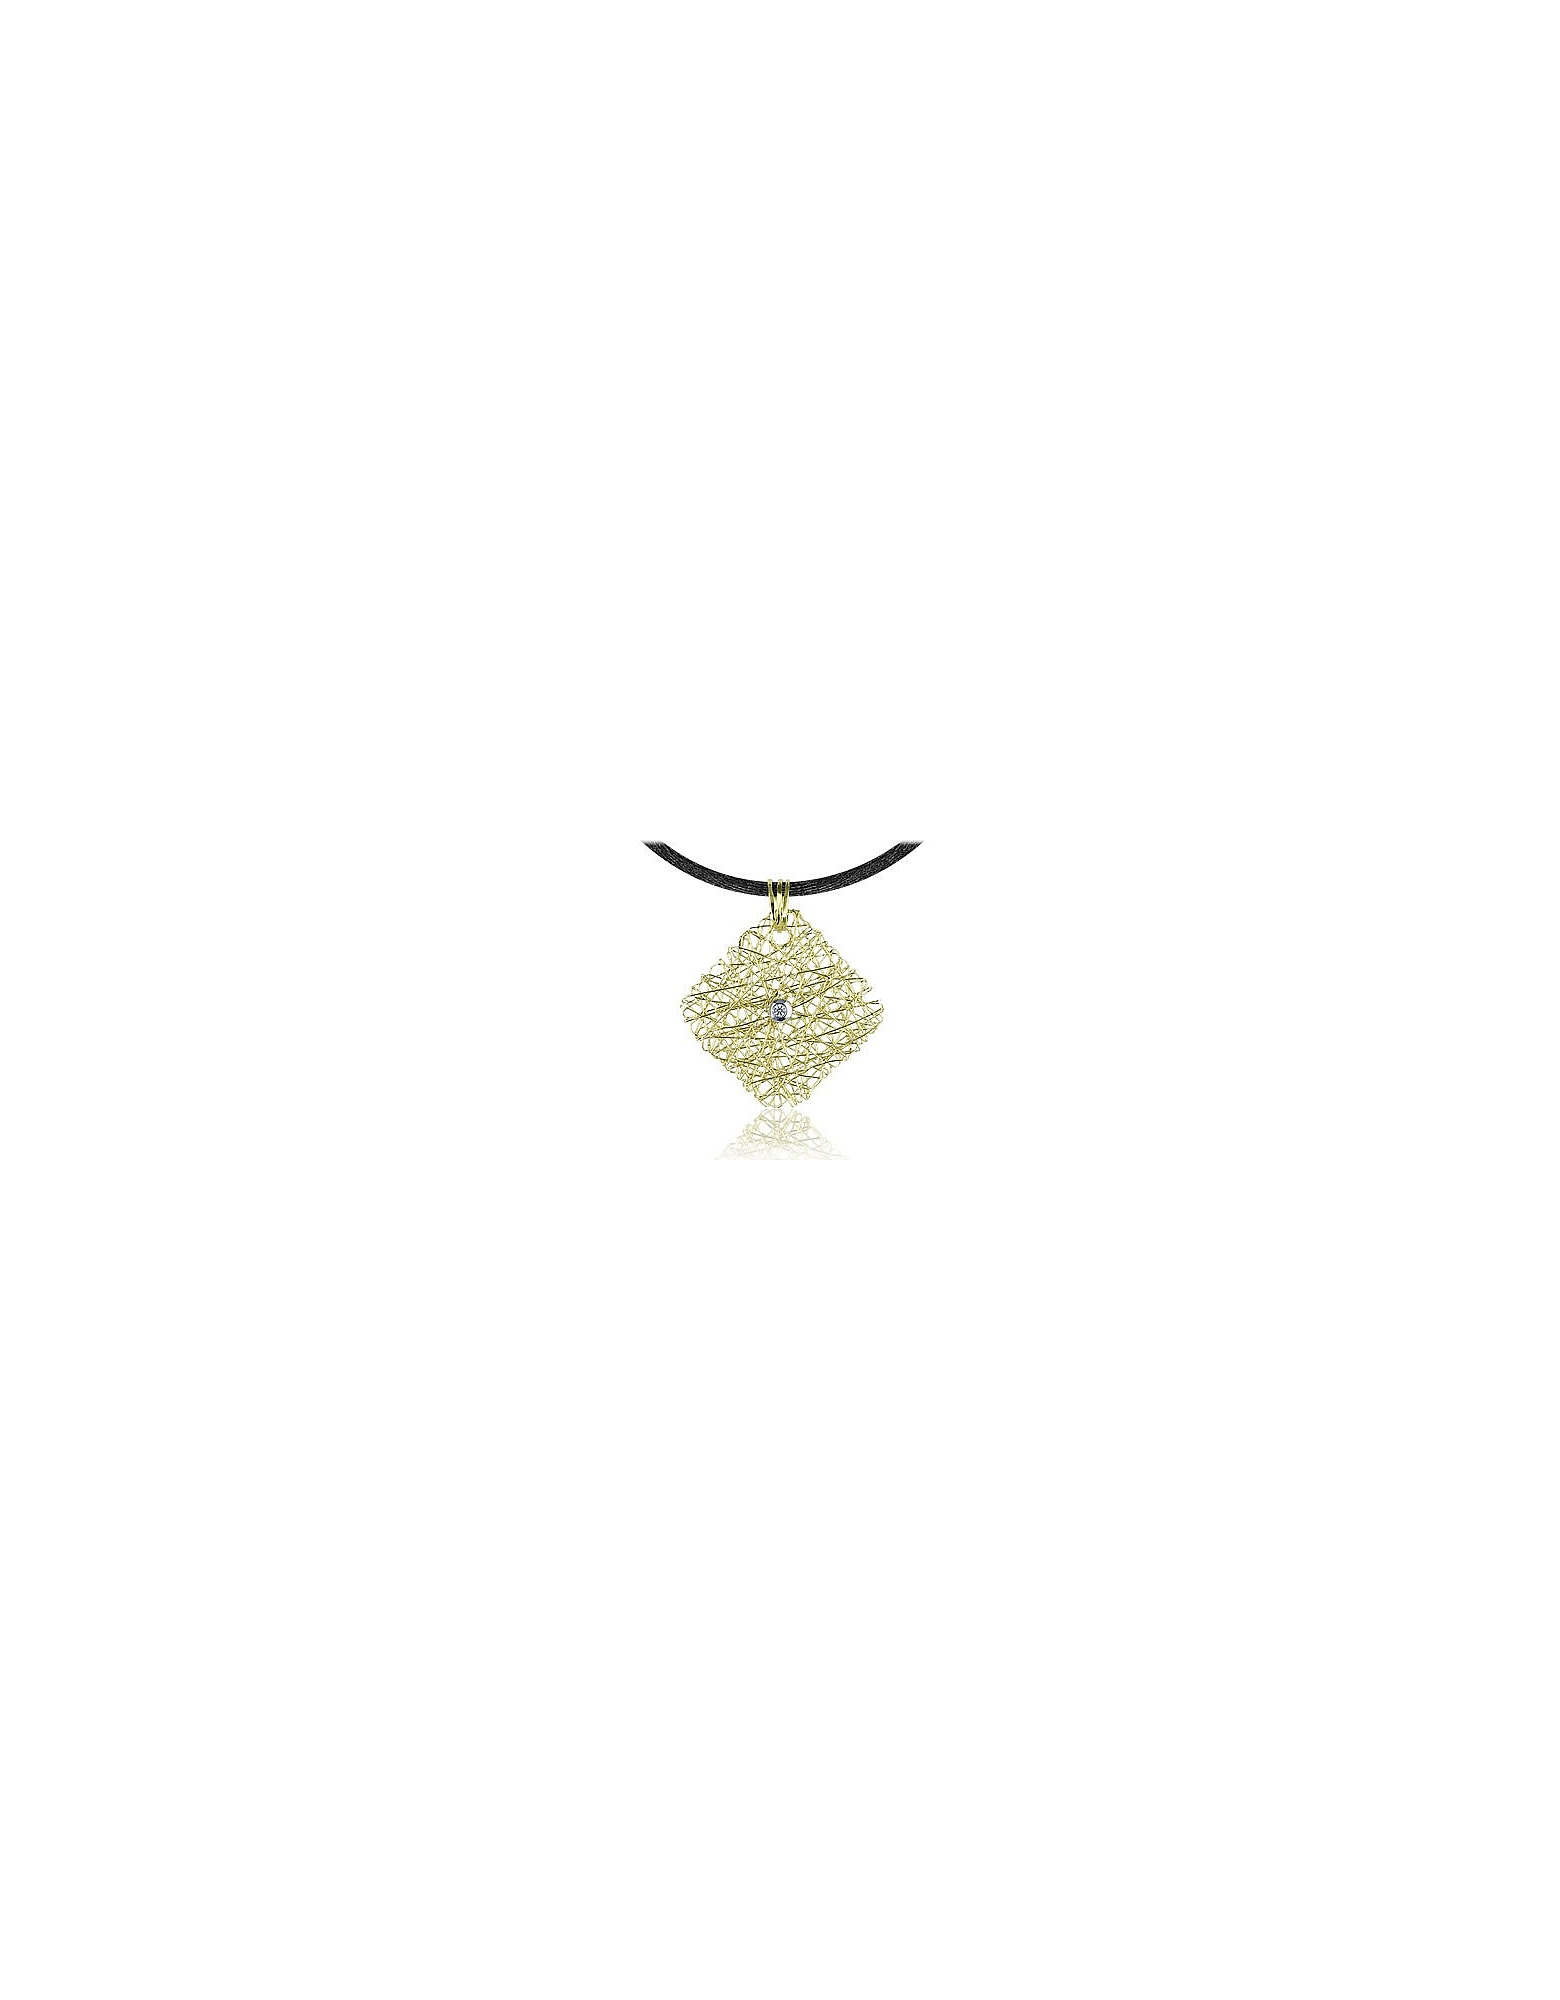 Orlando Orlandini Necklaces, Central Diamond 18K Yellow Gold Pendant w/Lace